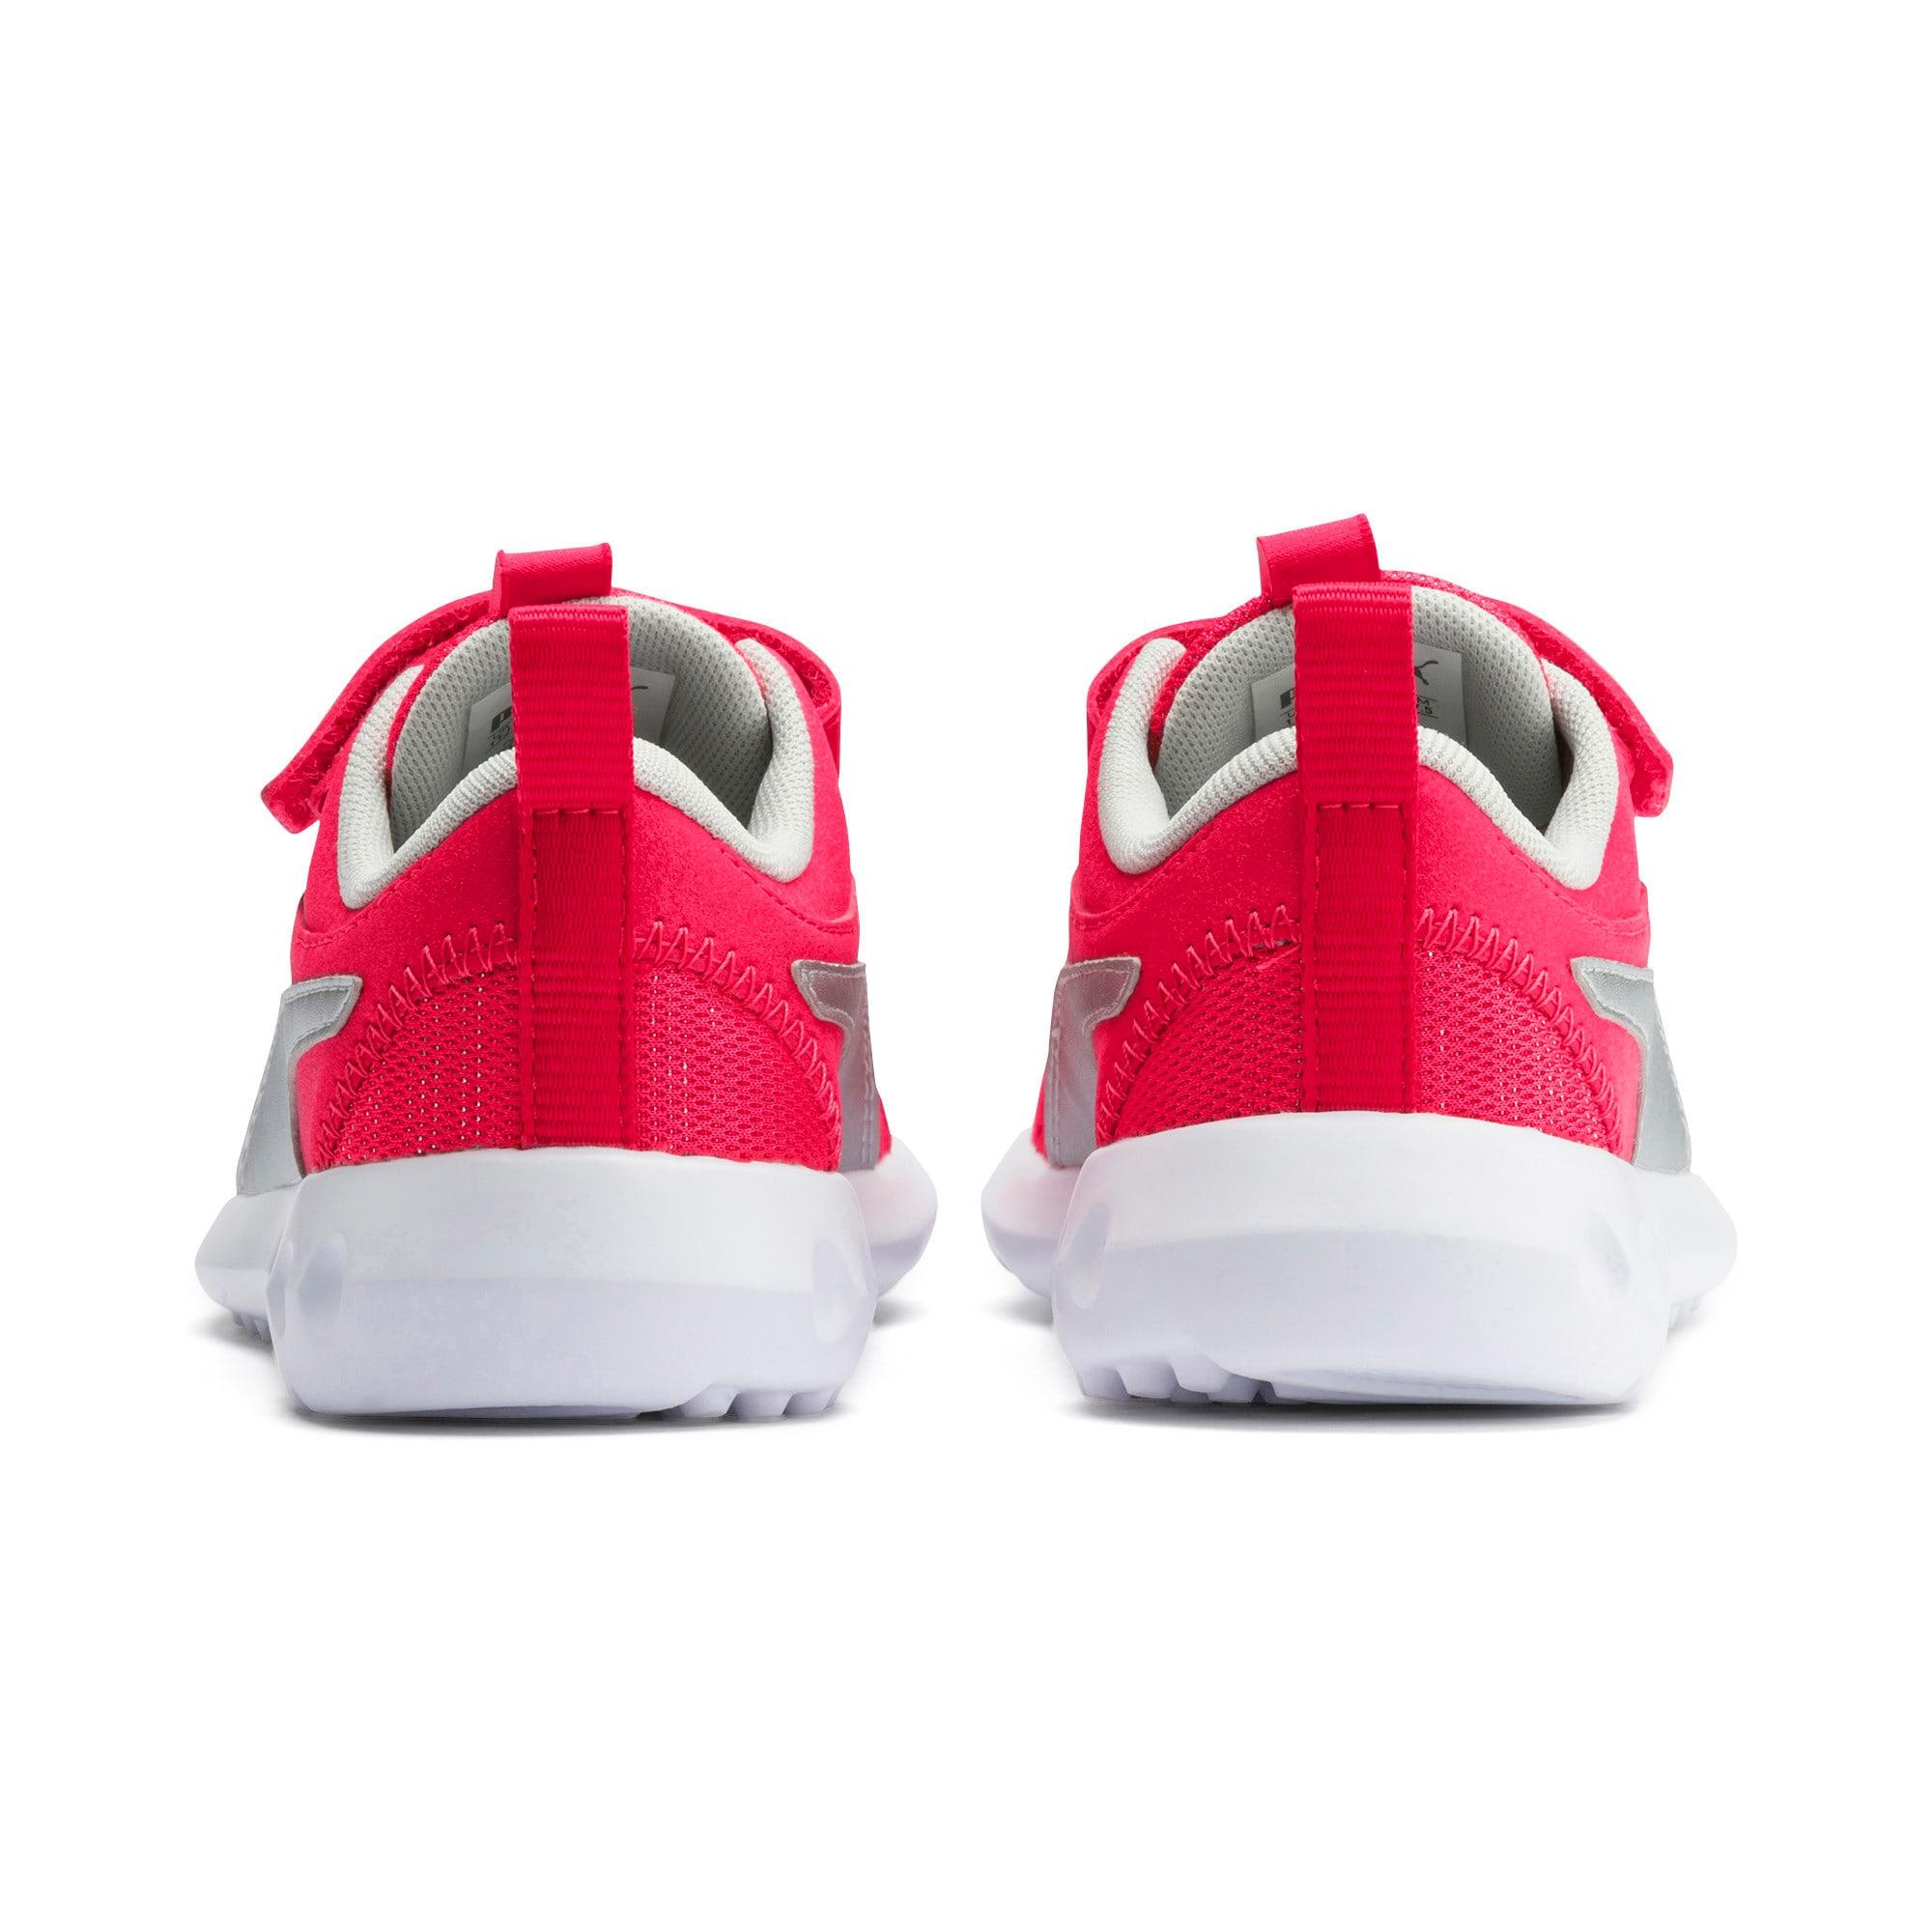 Thumbnail 3 of Carson 2 Glitz AC Shoes PS, Nrgy Rose-Silver, medium